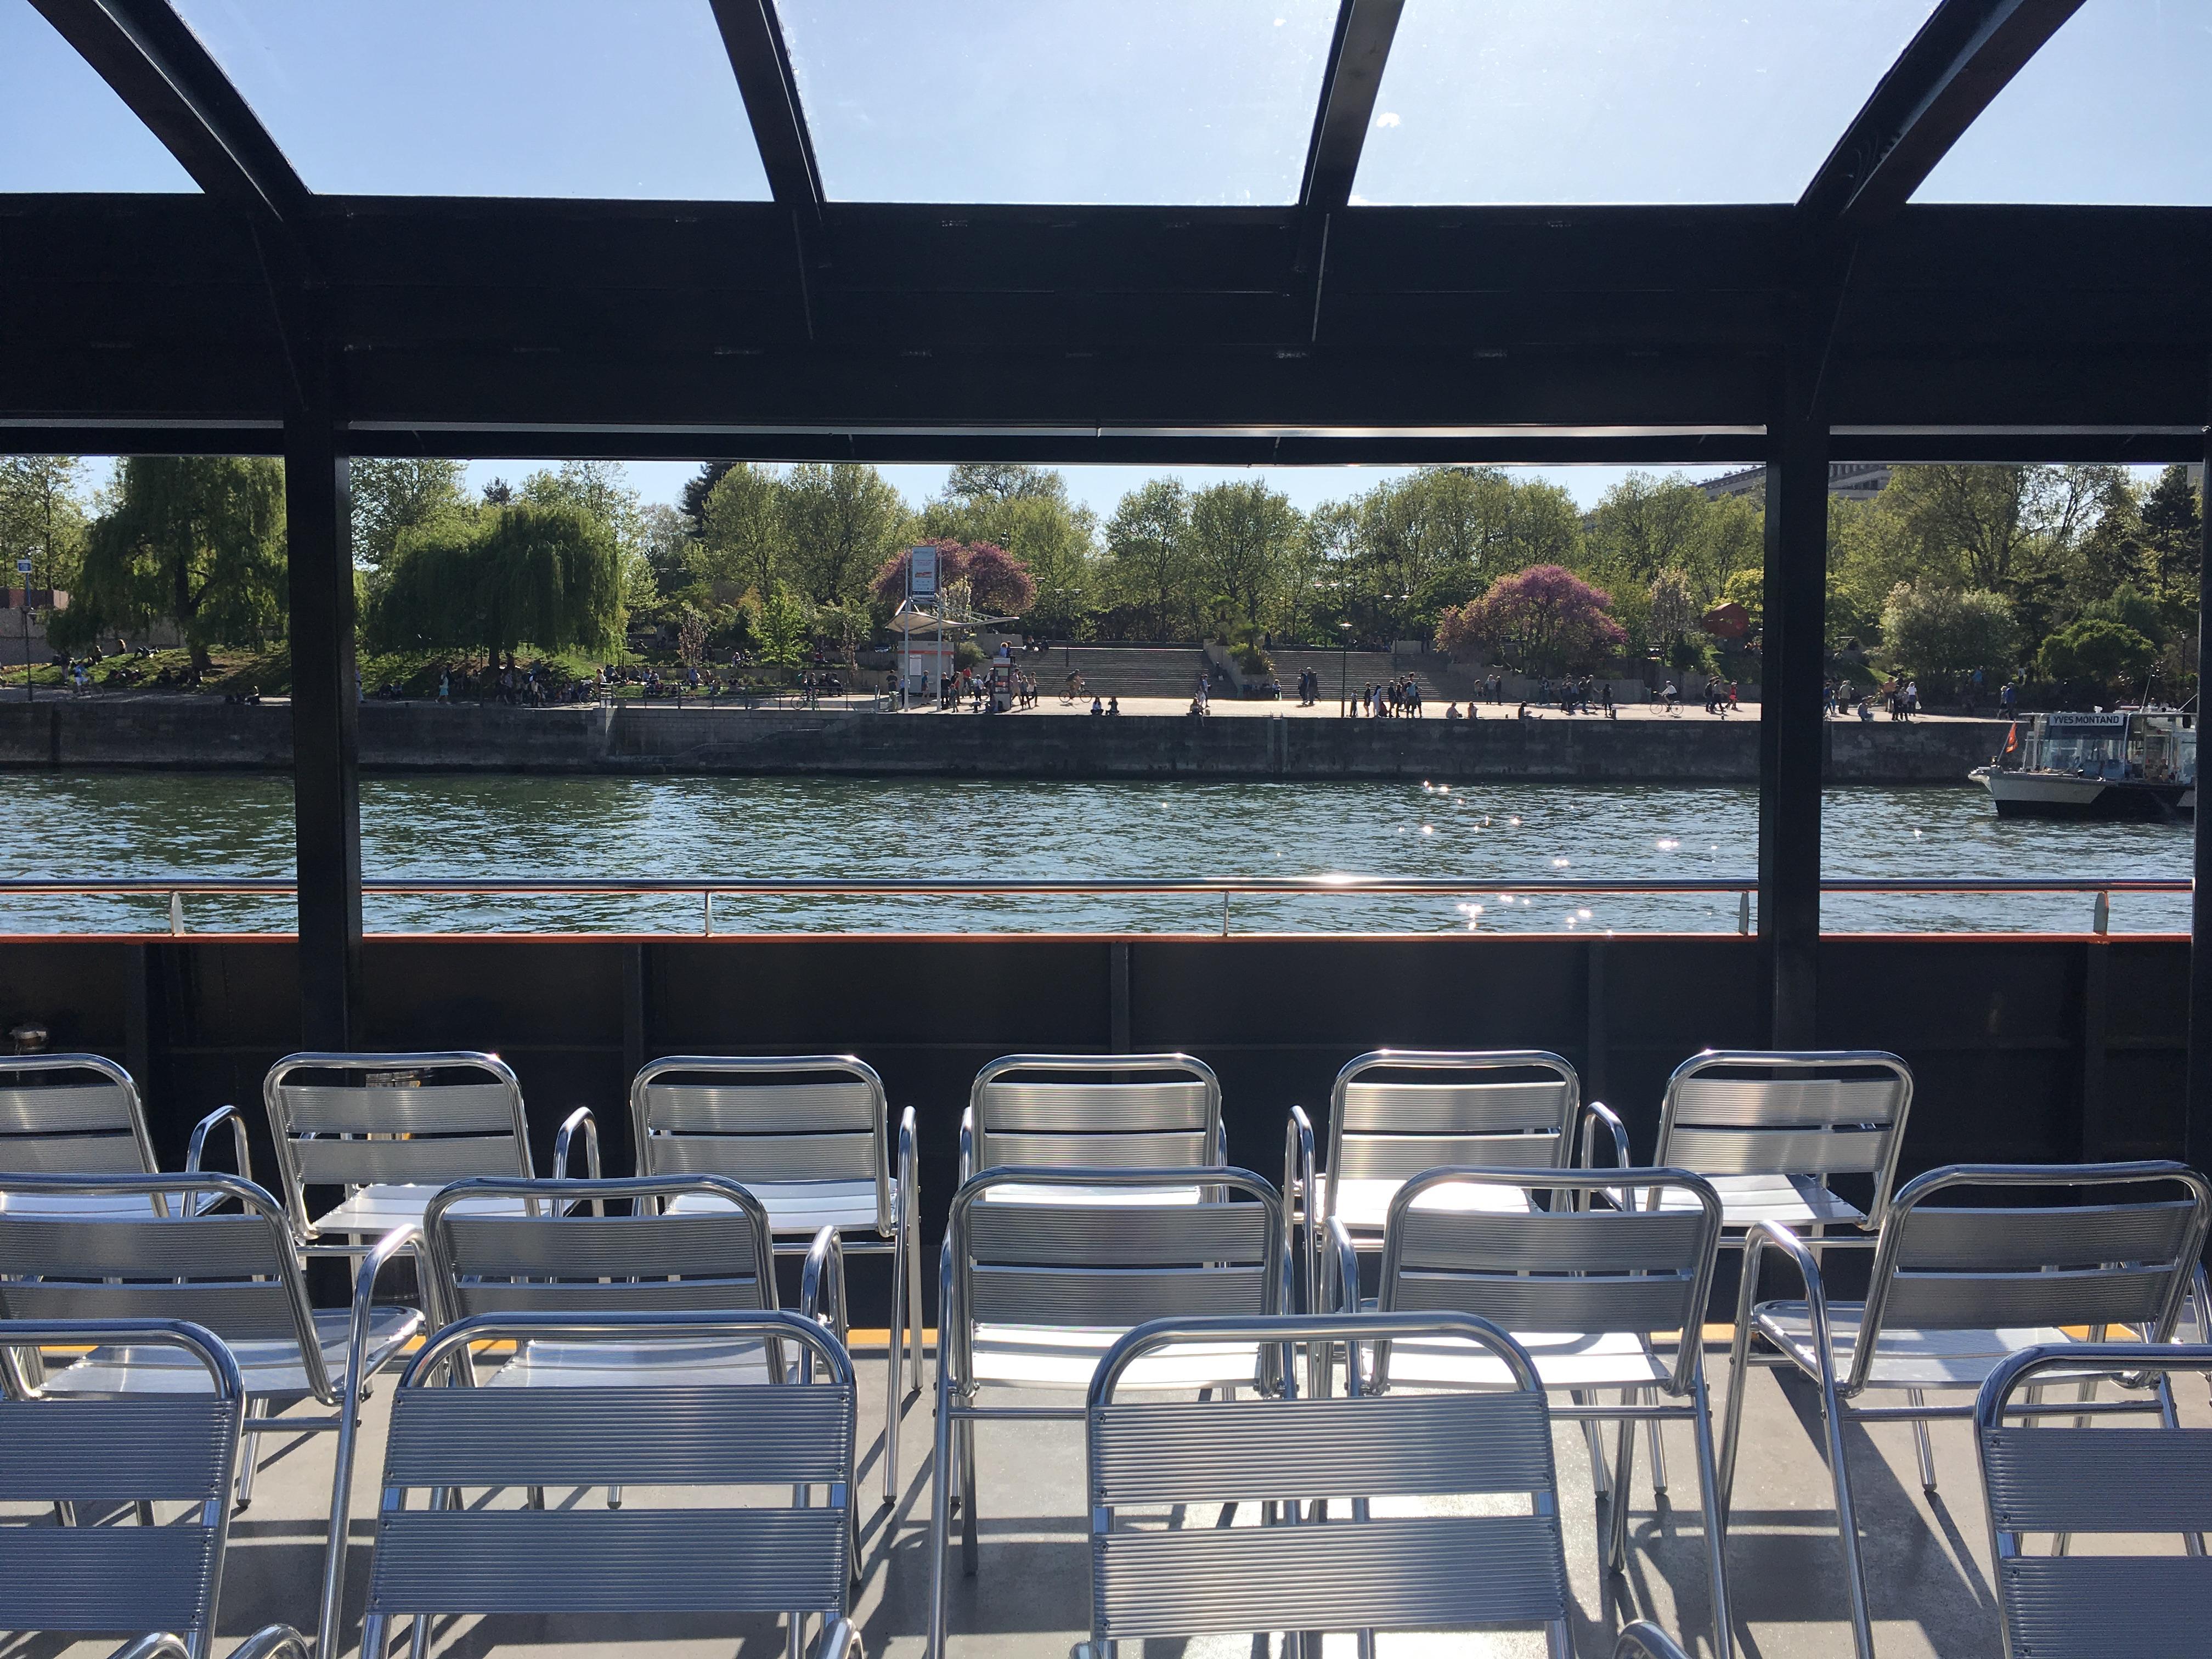 Croisiere-promenade-sightseeing-cruise-bateau-visit-paris-navigation-Insolite-glass-roof-vitre-ouvert-open